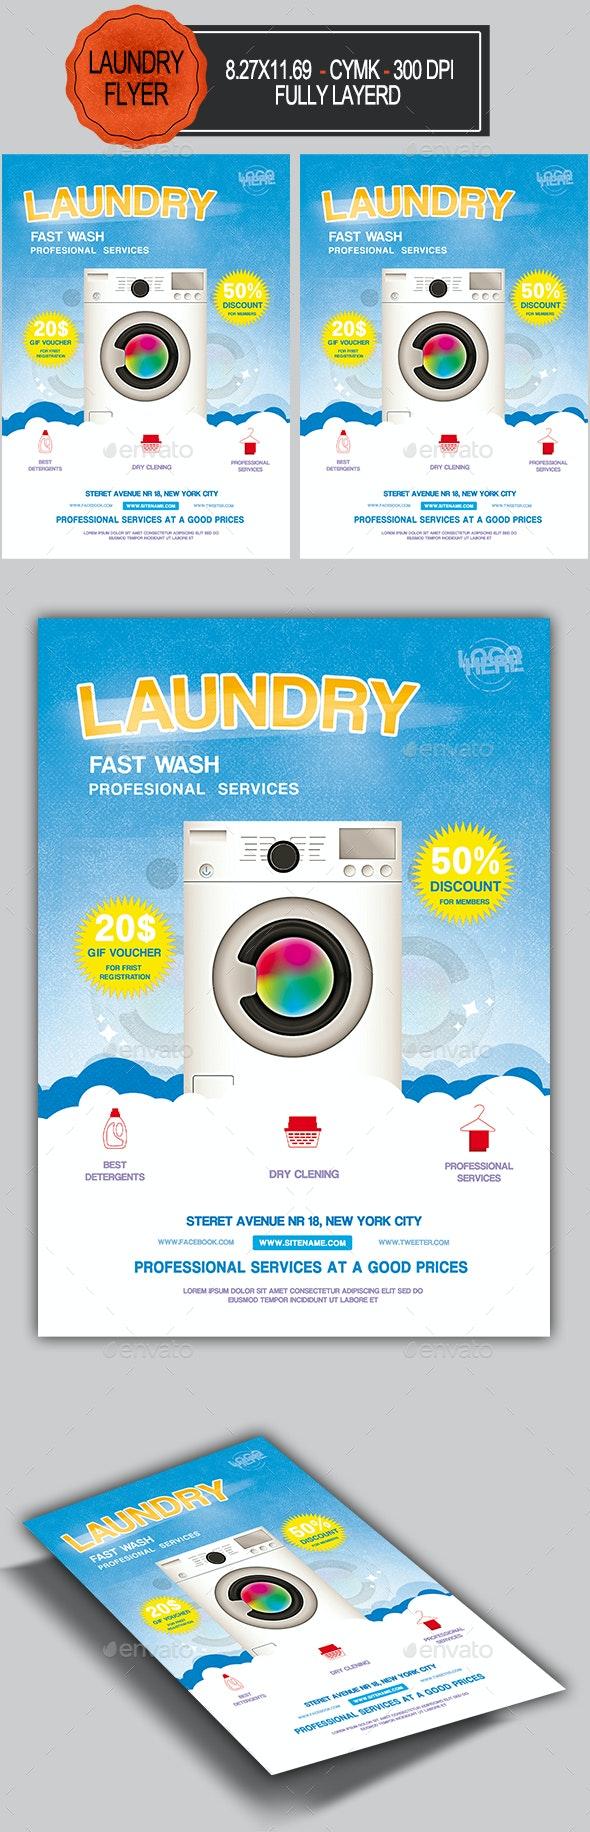 Laundry Flyer - Commerce Flyers